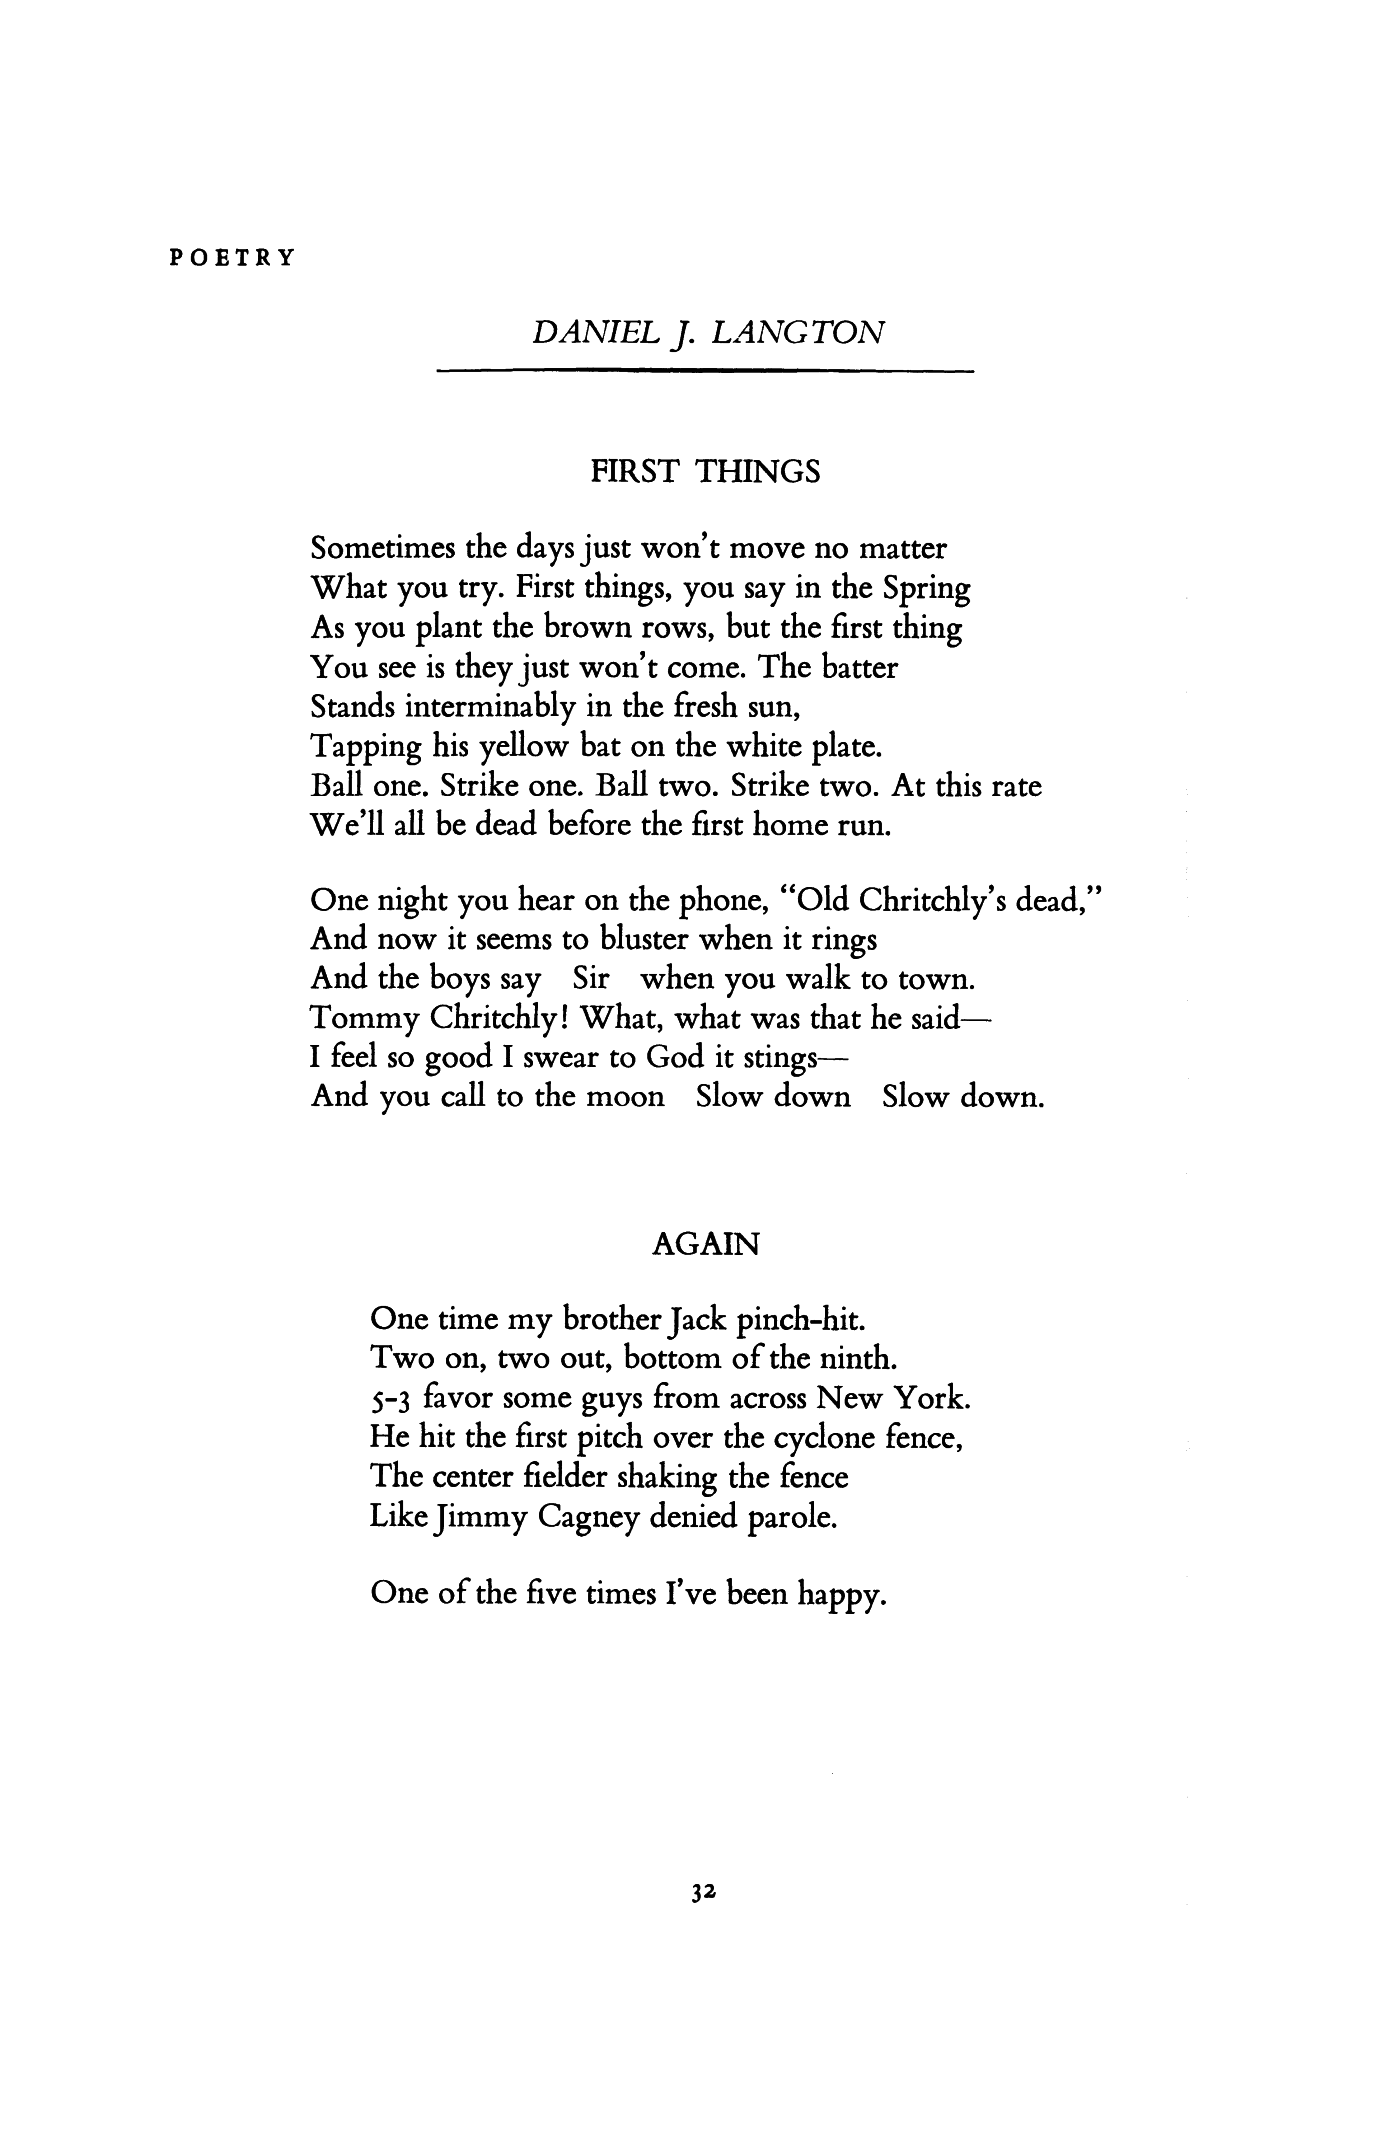 First Things by Daniel J. Langton | Again by Daniel J. Langton | Poetry  Magazine